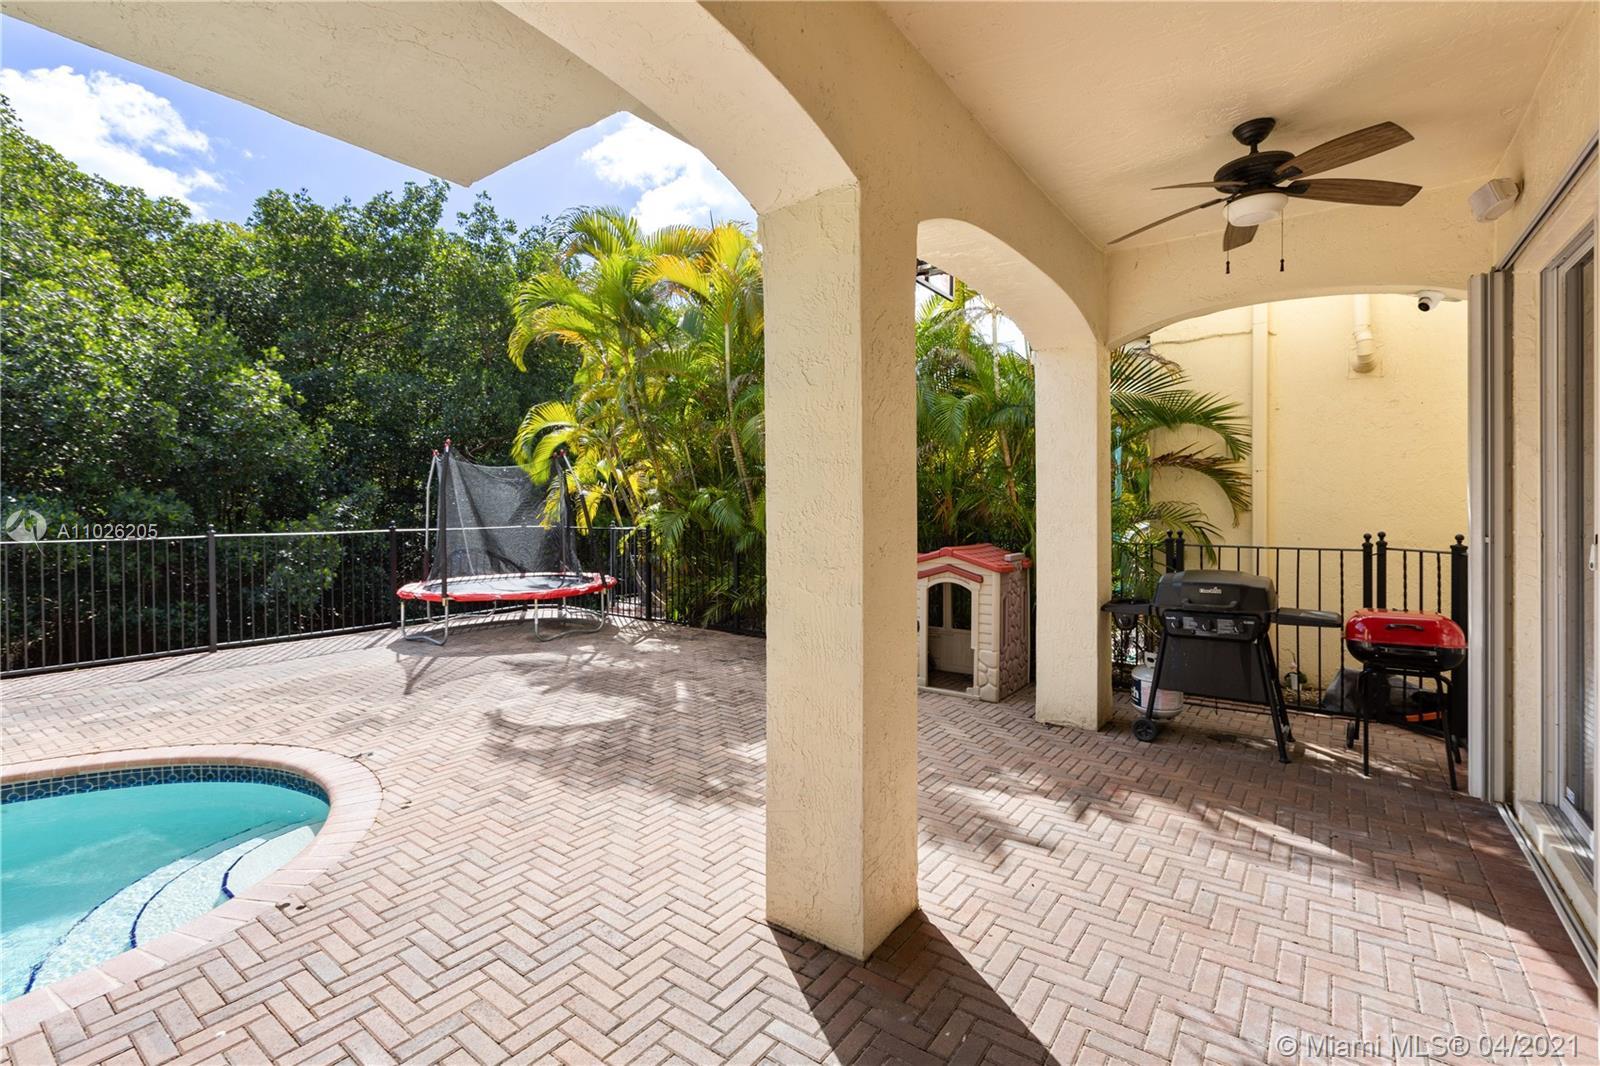 Photo of 21229 33rd Ave, Aventura, Florida, 33180 -